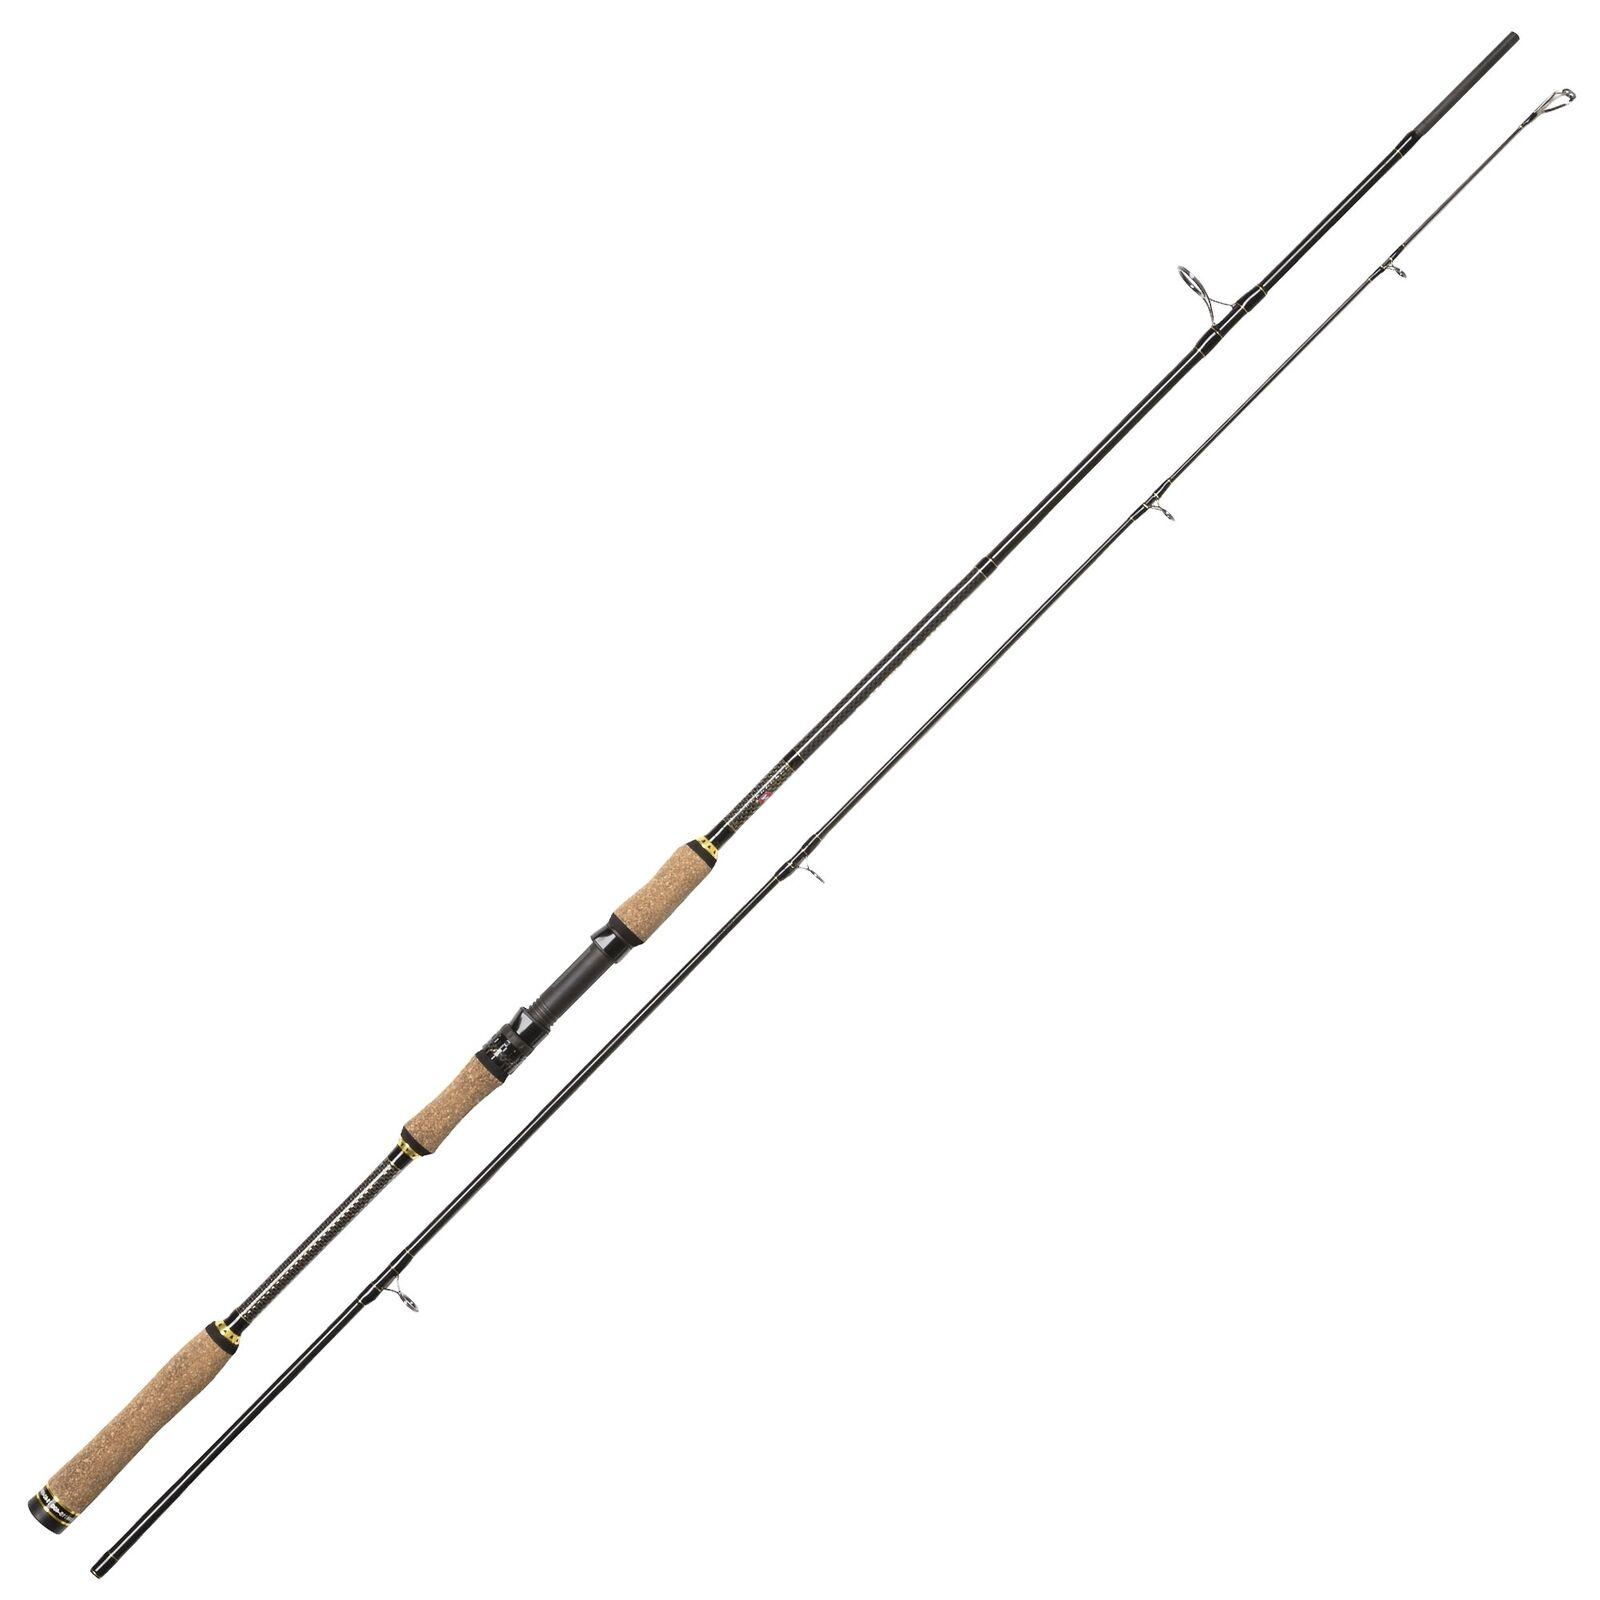 Penn régiment II sw spin 240-270cm eau salée spinnrute canne à pêche 15-40g 20-50g